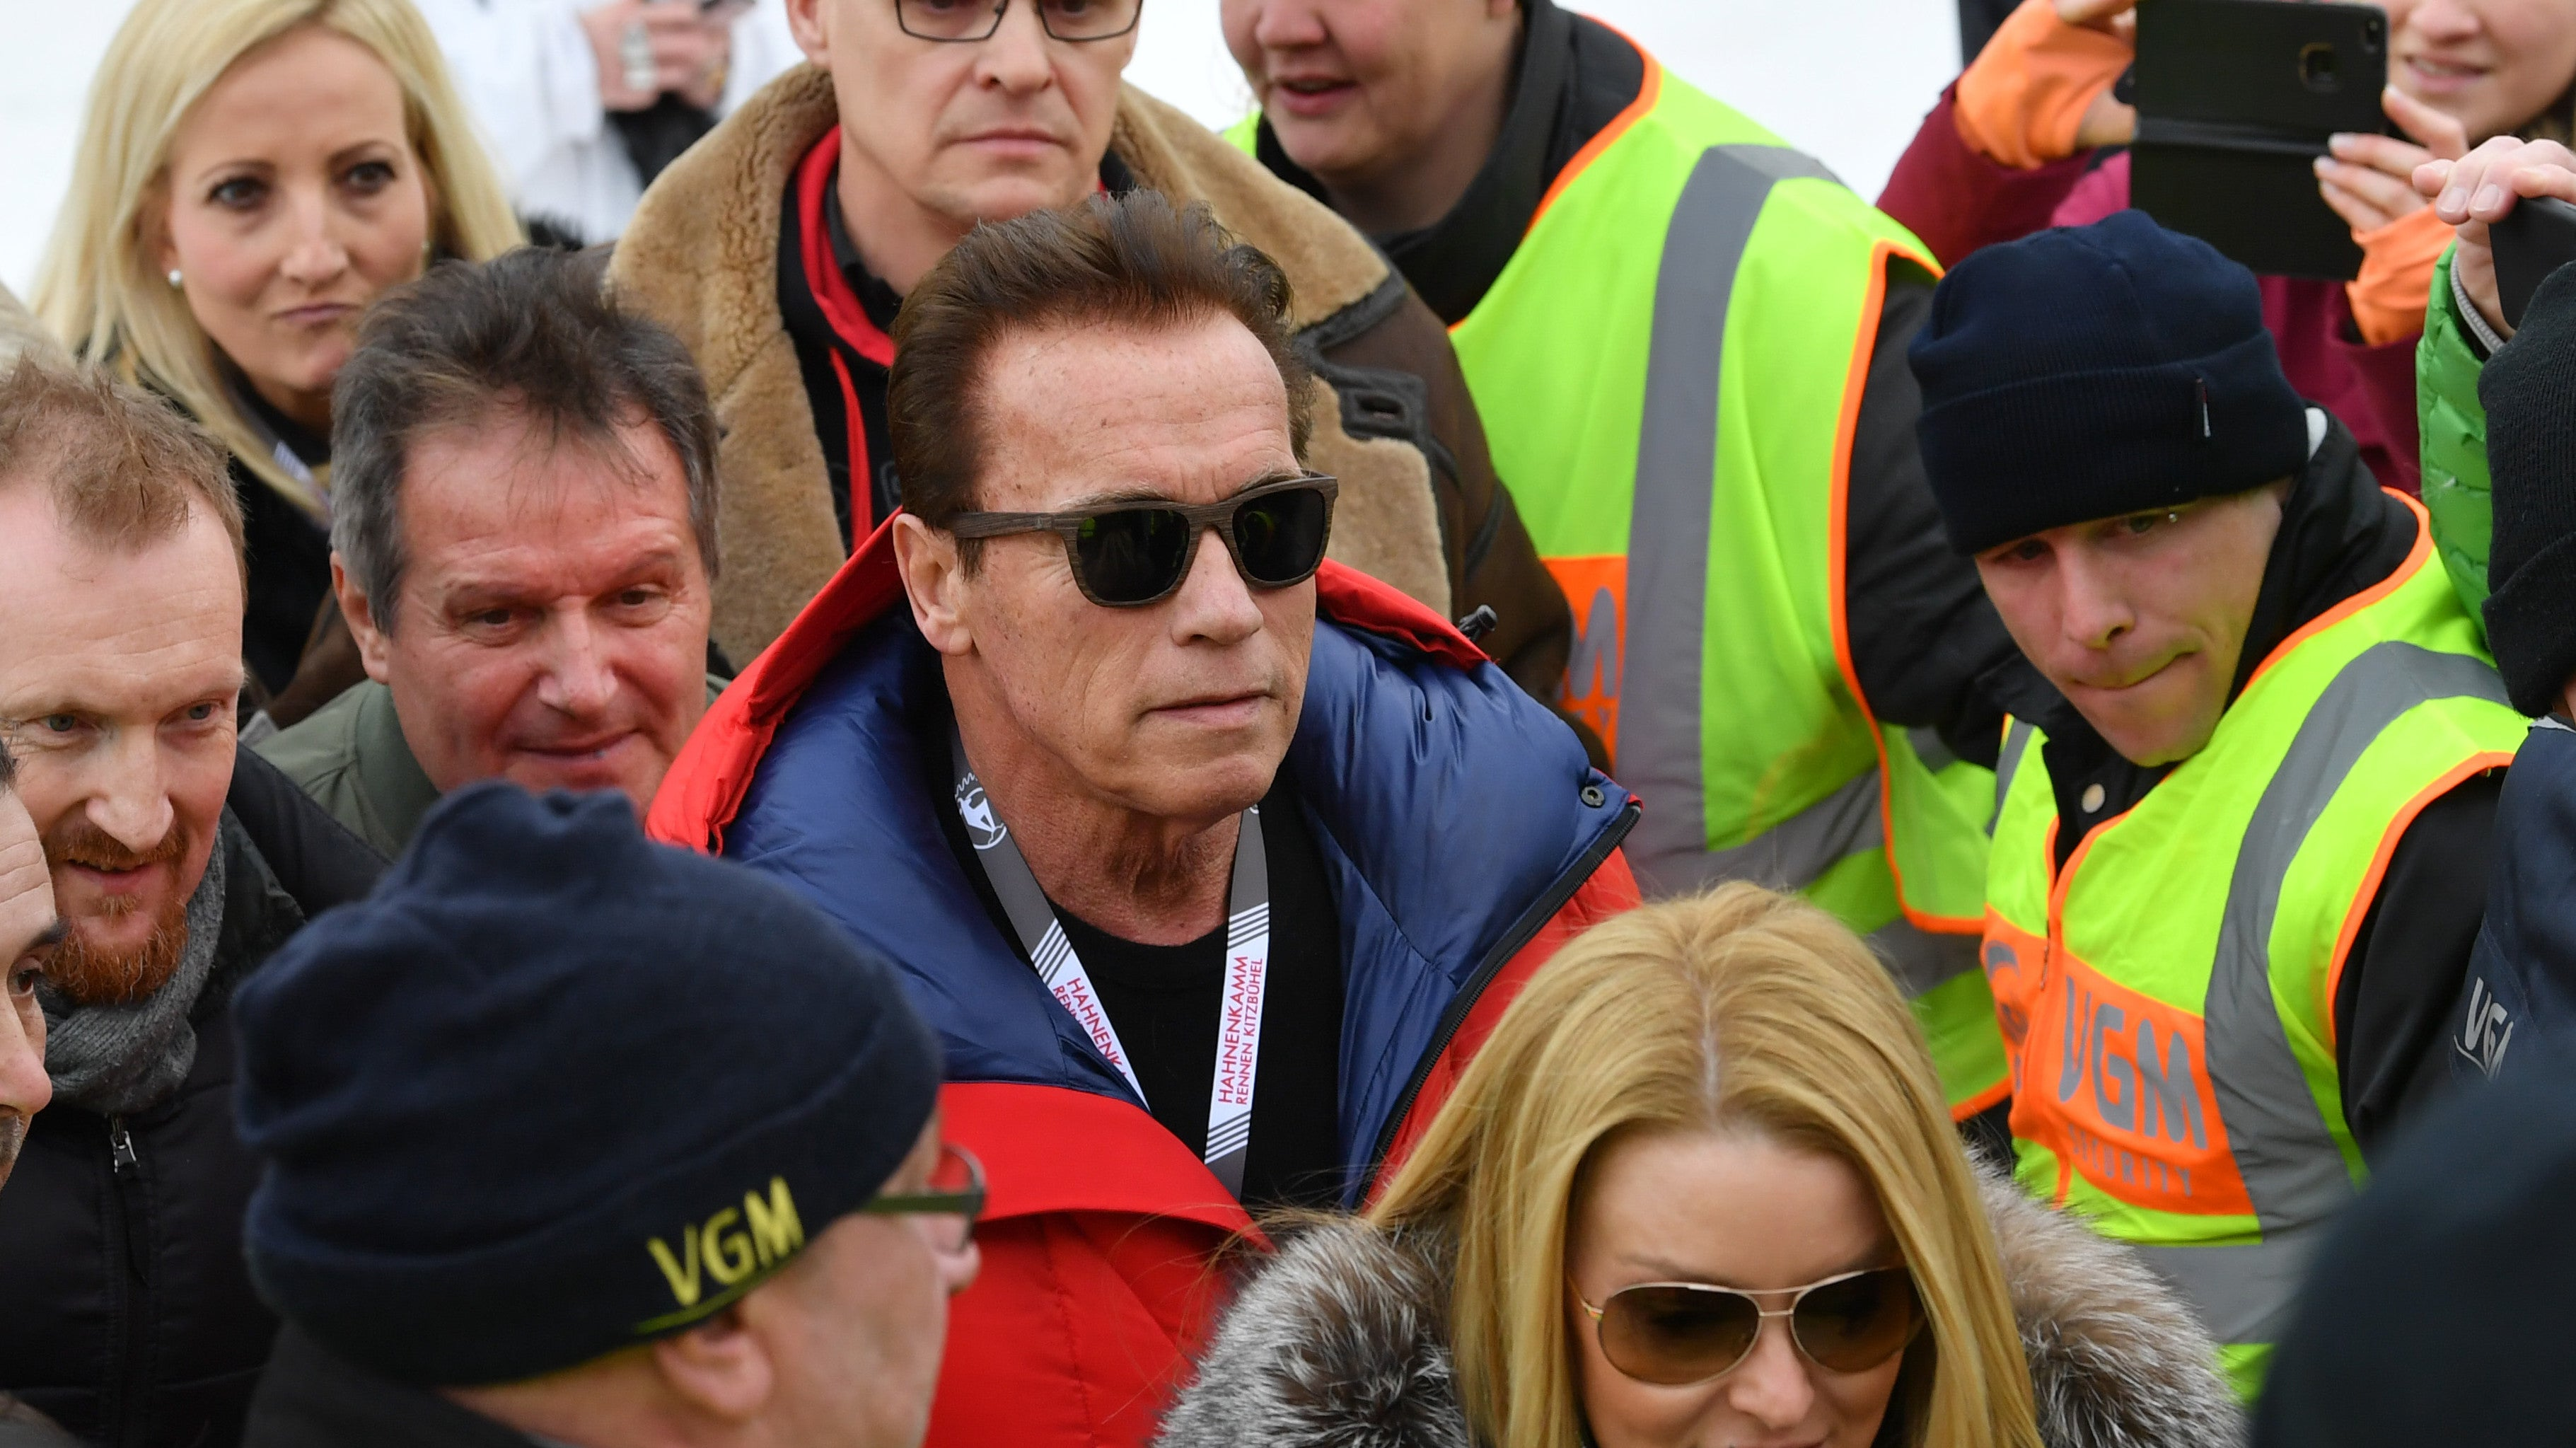 Arnold Schwarzenegger Sues Creator Of Nightmarish Robot Lookalike For $10 Million, And Wouldn't You?